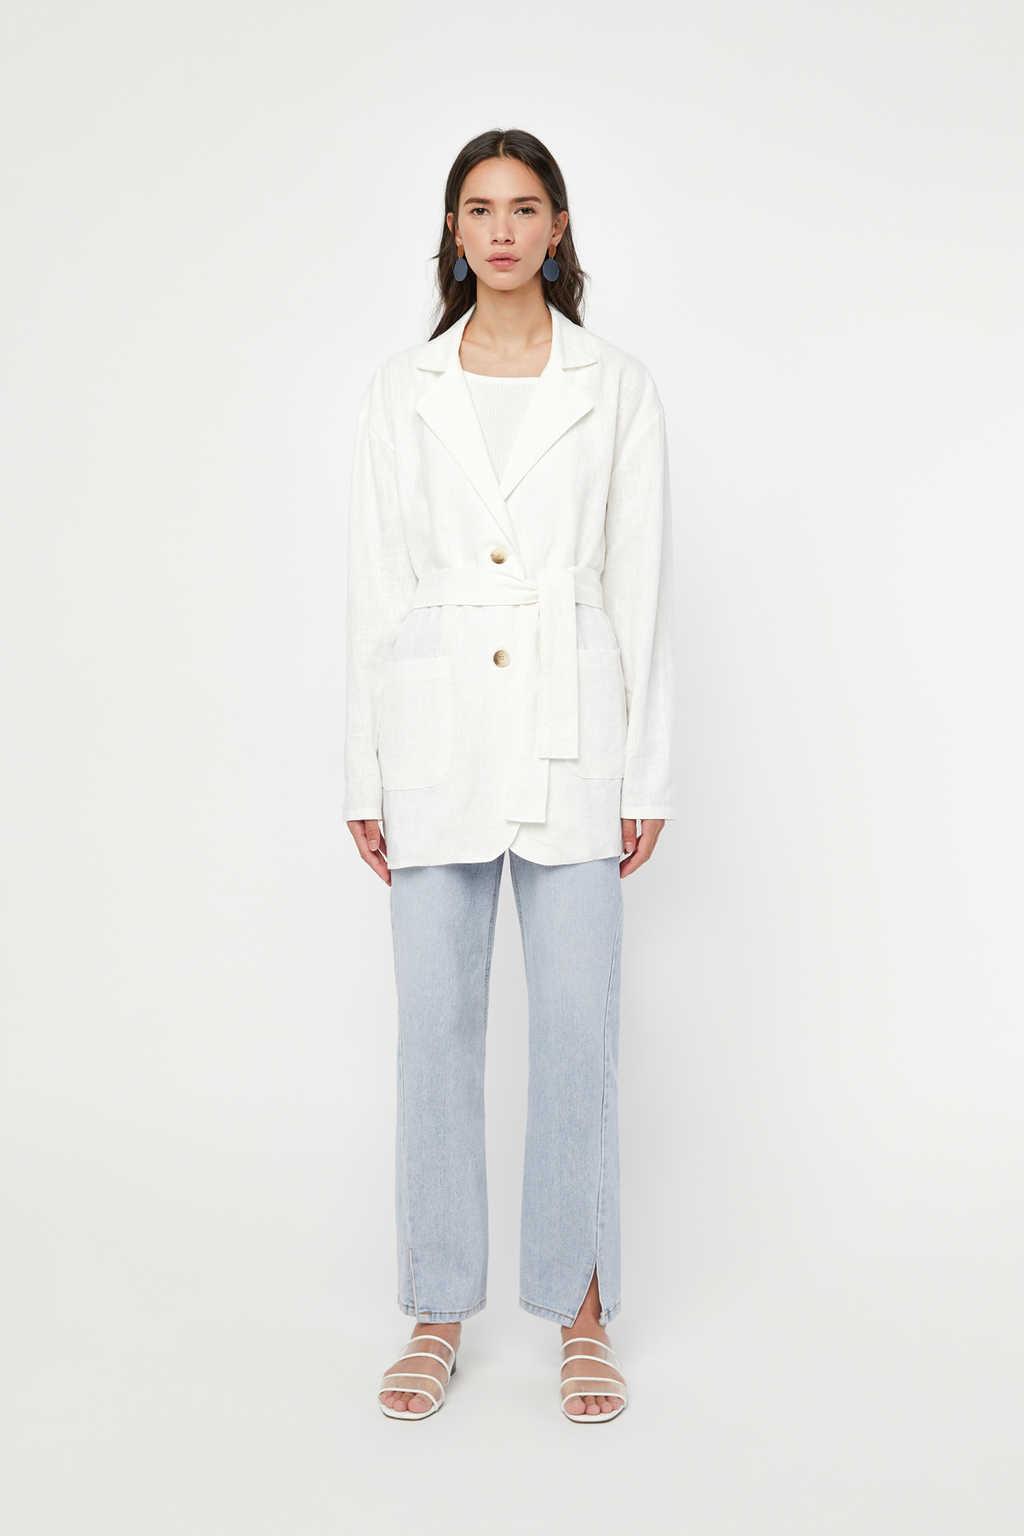 Jacket K019 Cream 2